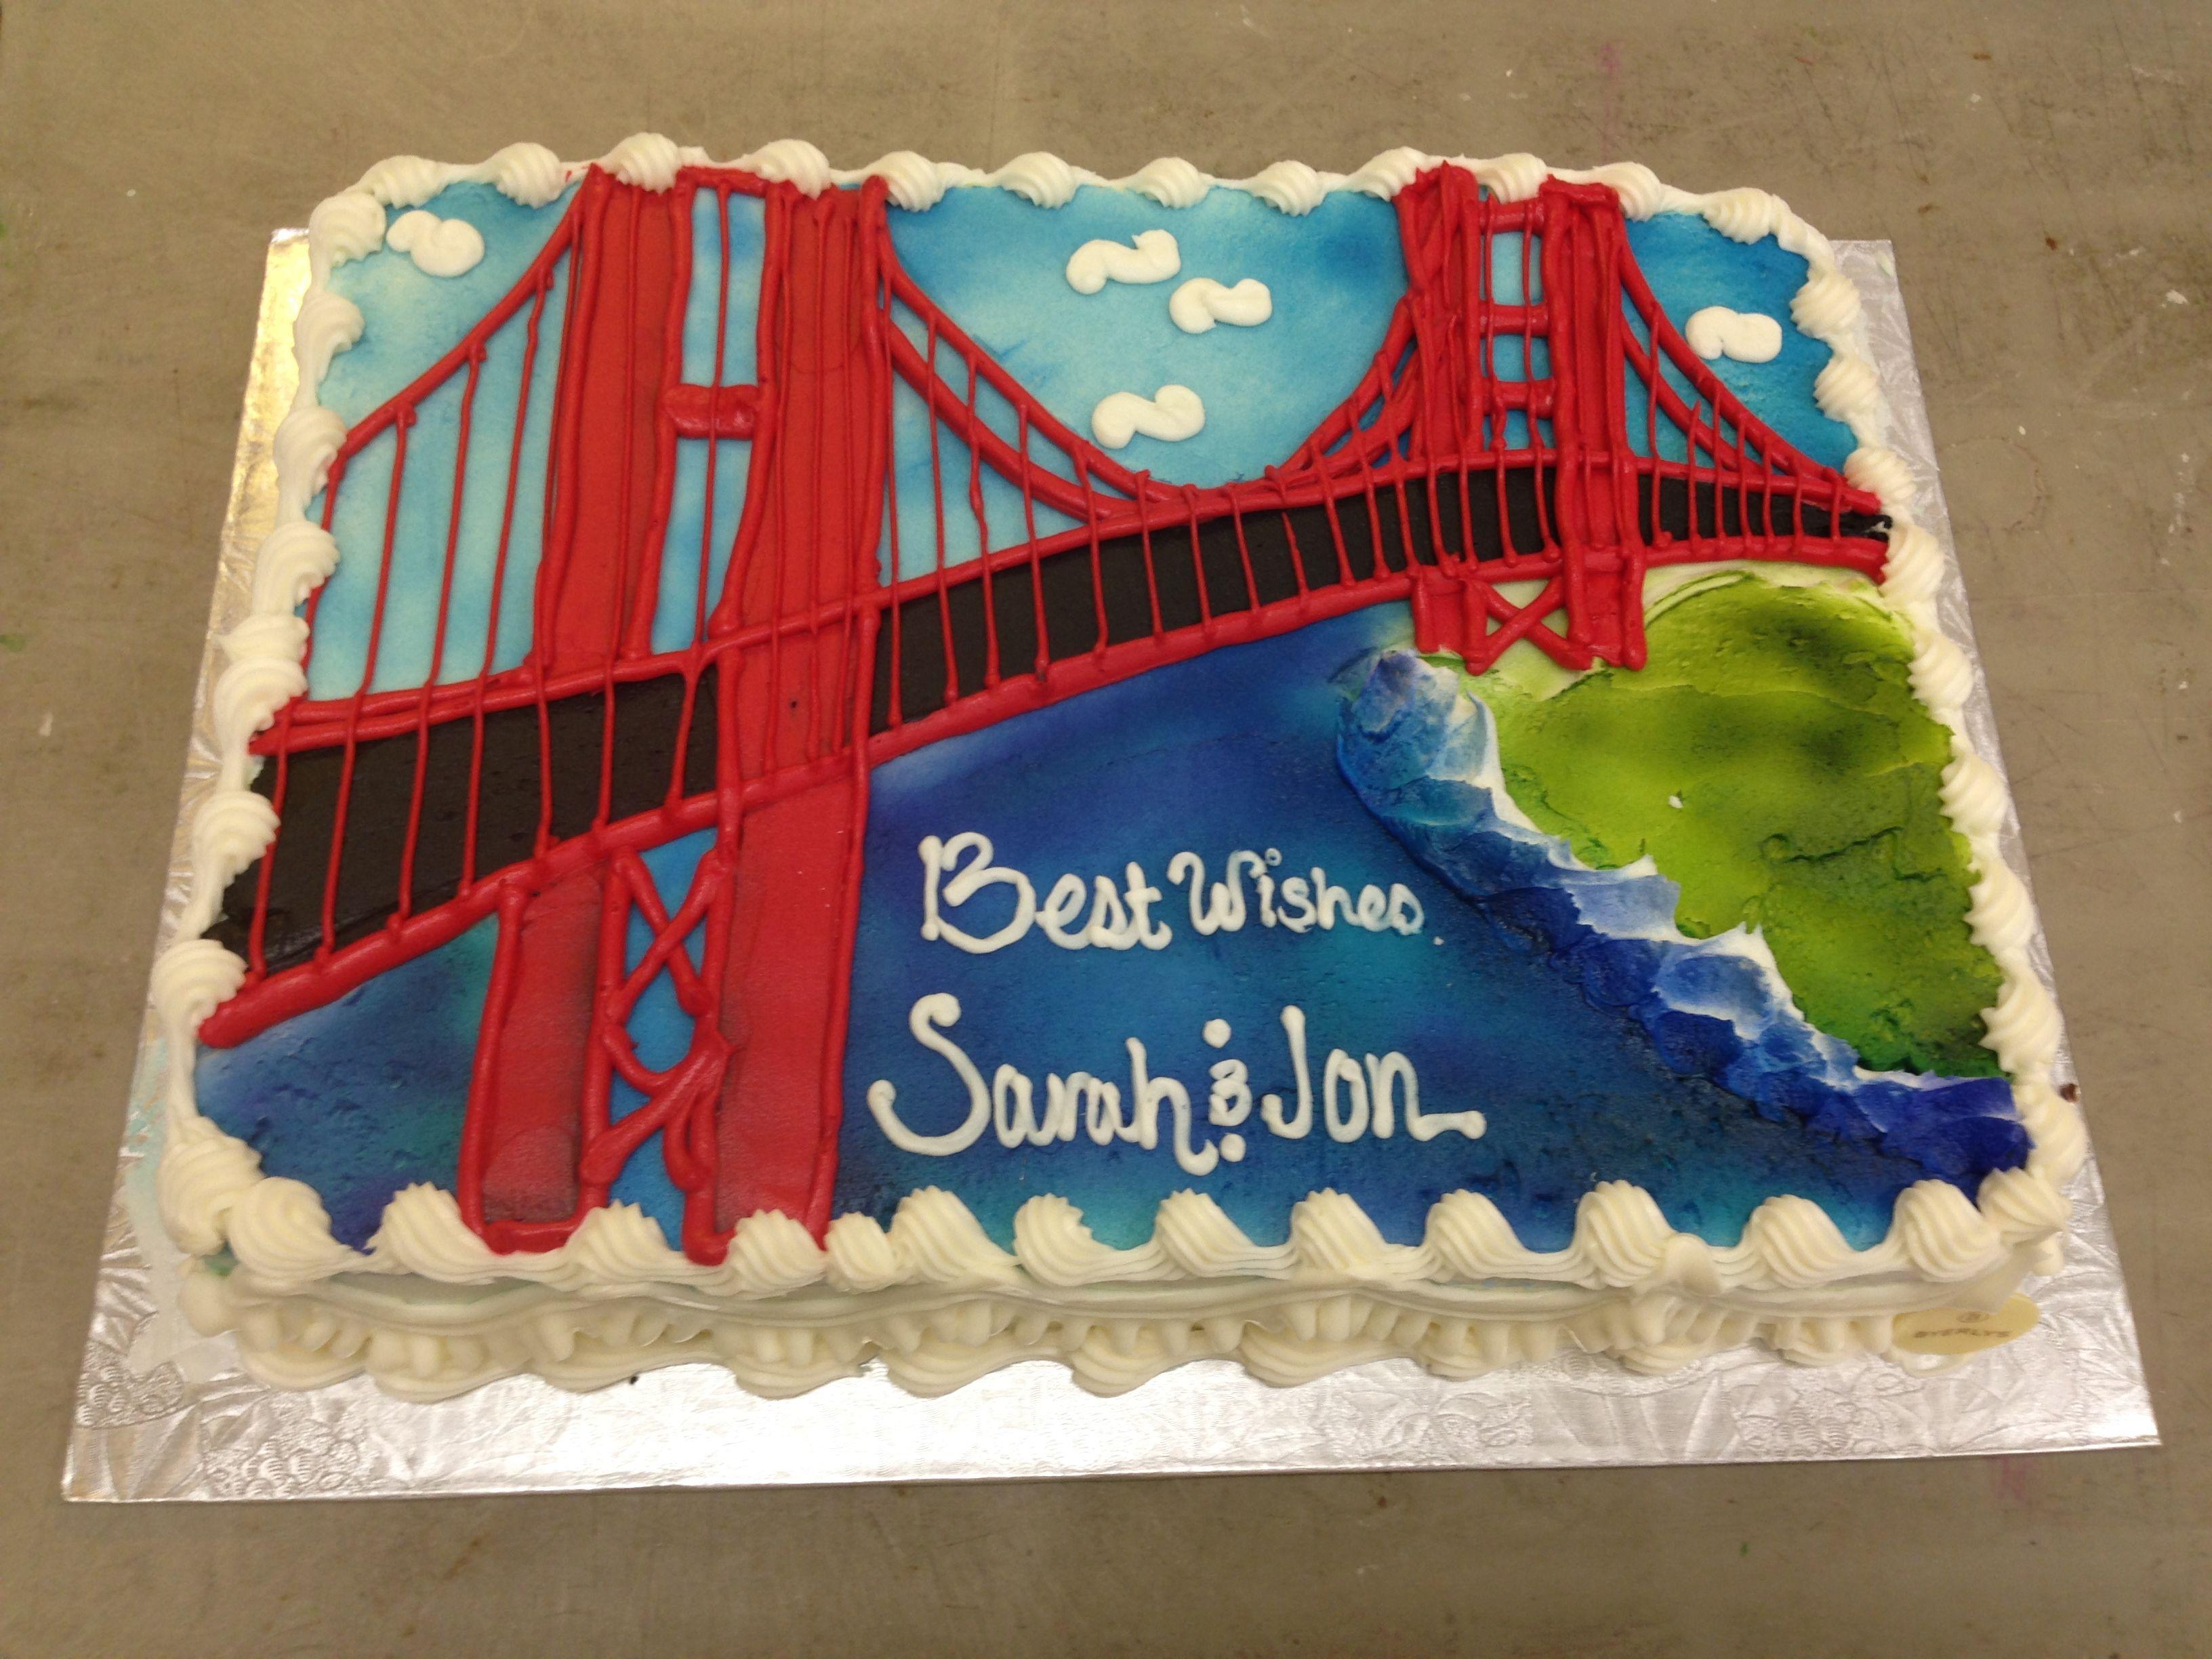 1 2 Sheet Golden Gate Bridge Engagement Cake Cakes